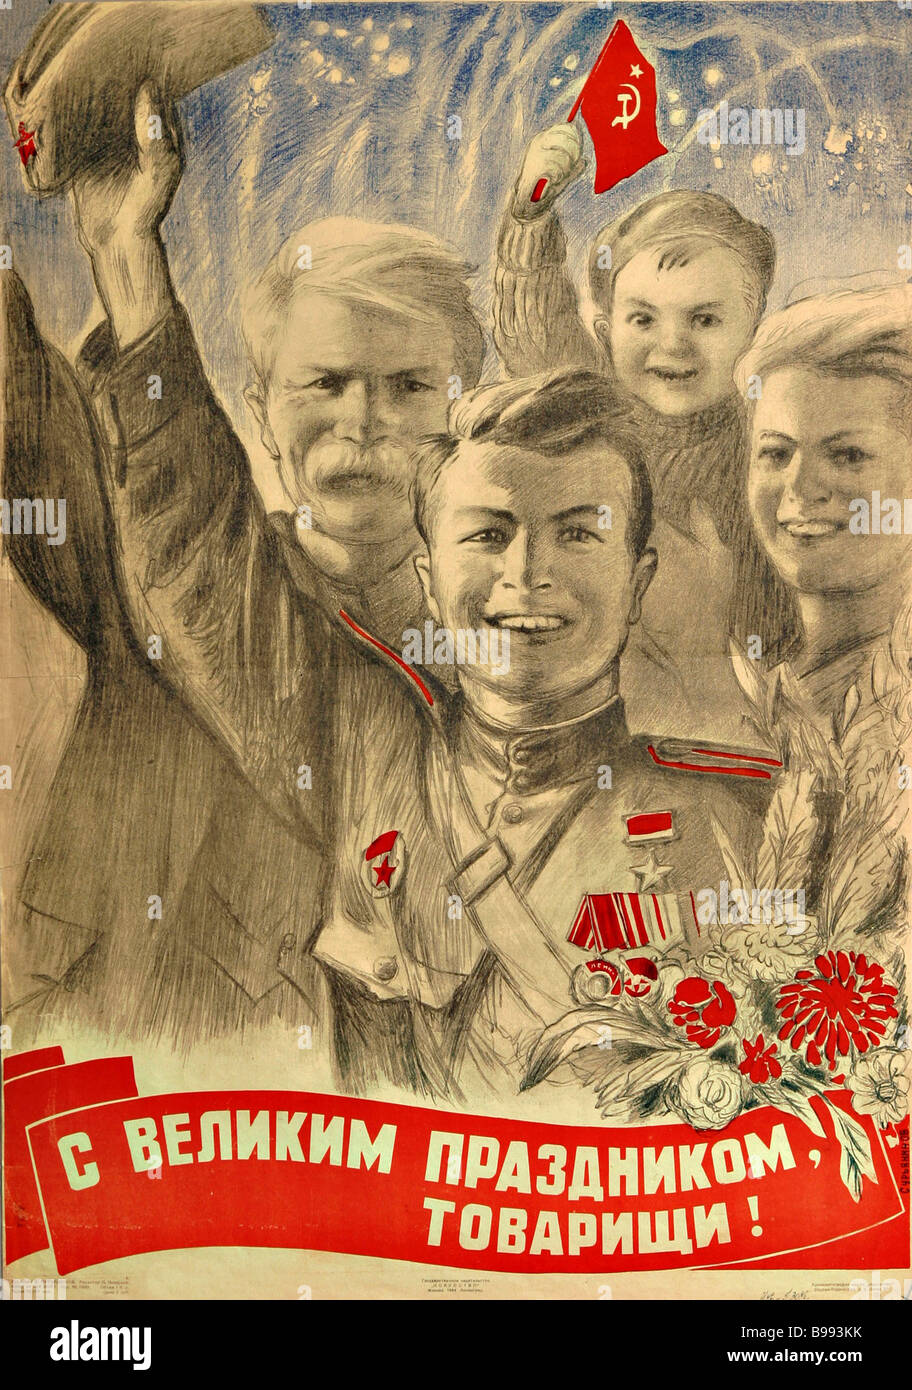 V Suryaninov poster Congratulations on a great holiday comrades 1944 Stock Photo